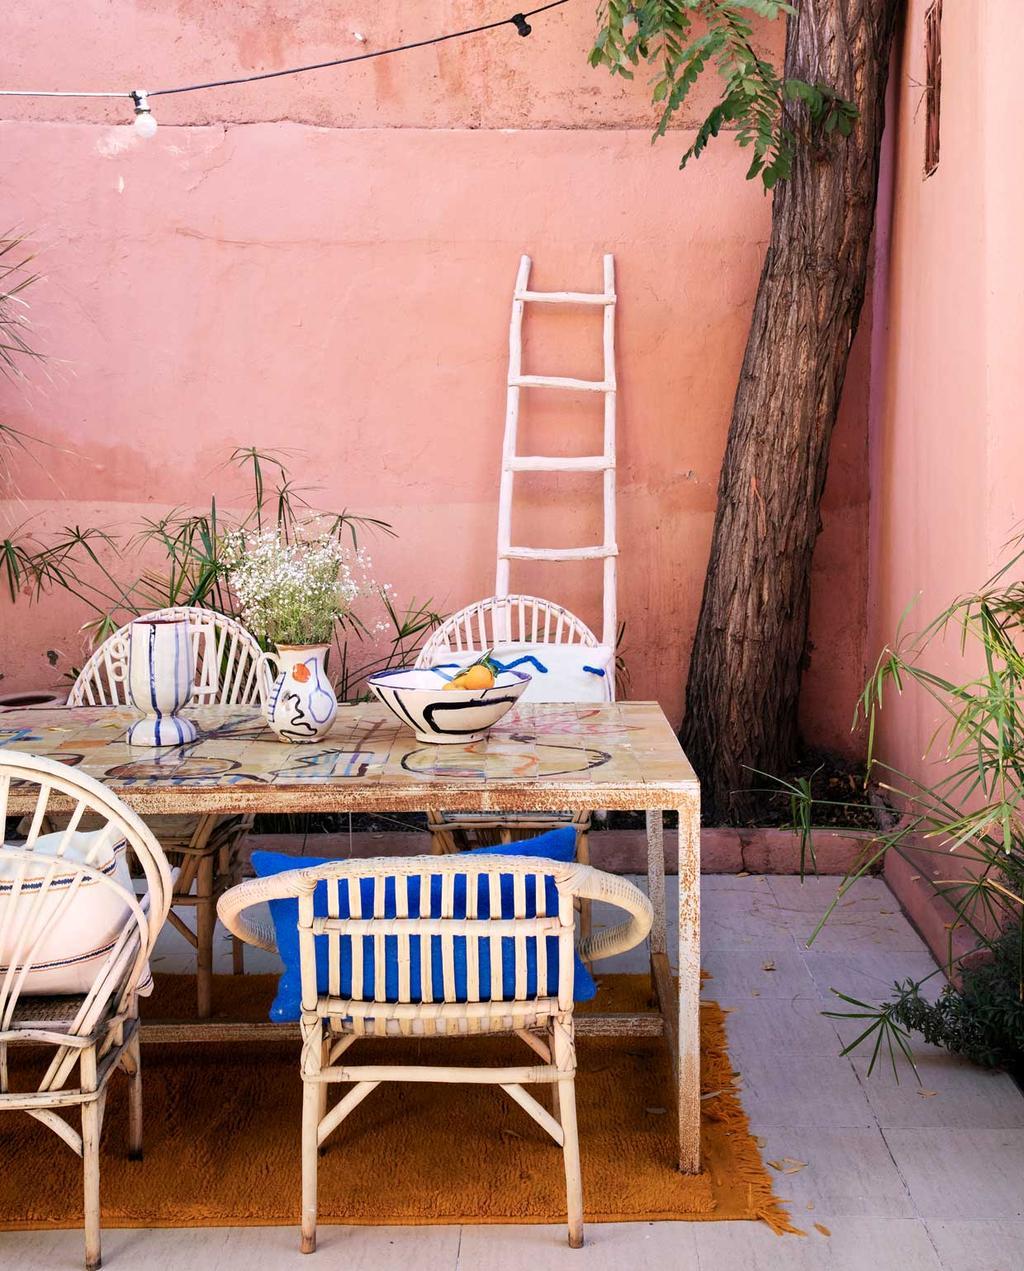 vtwonen 2020-09 | Binnenkijken marrakech | roze patio